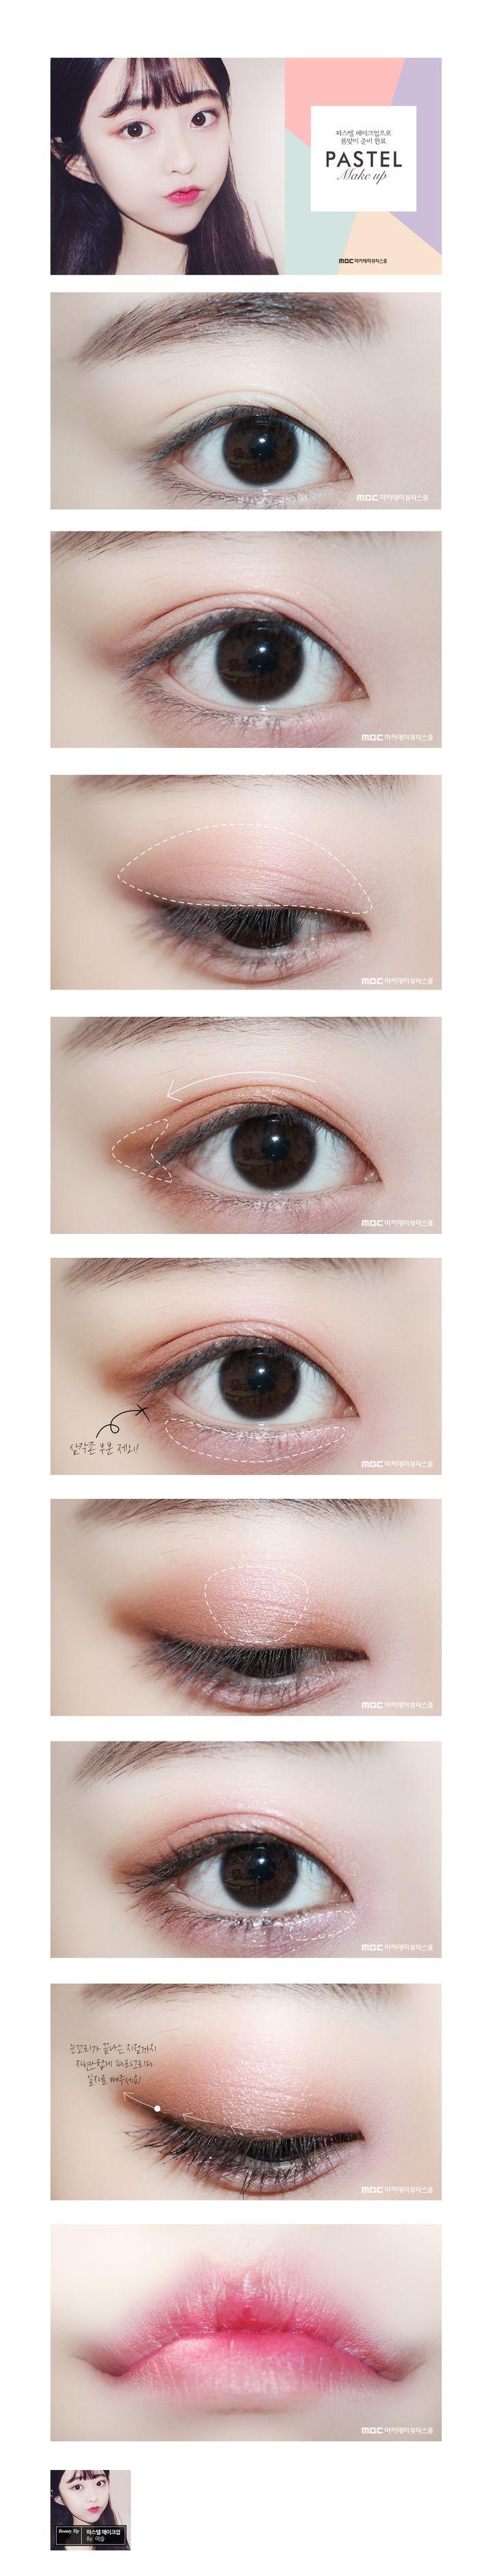 [SNS] Blog- Pastel Make up; Beauty Contents Design